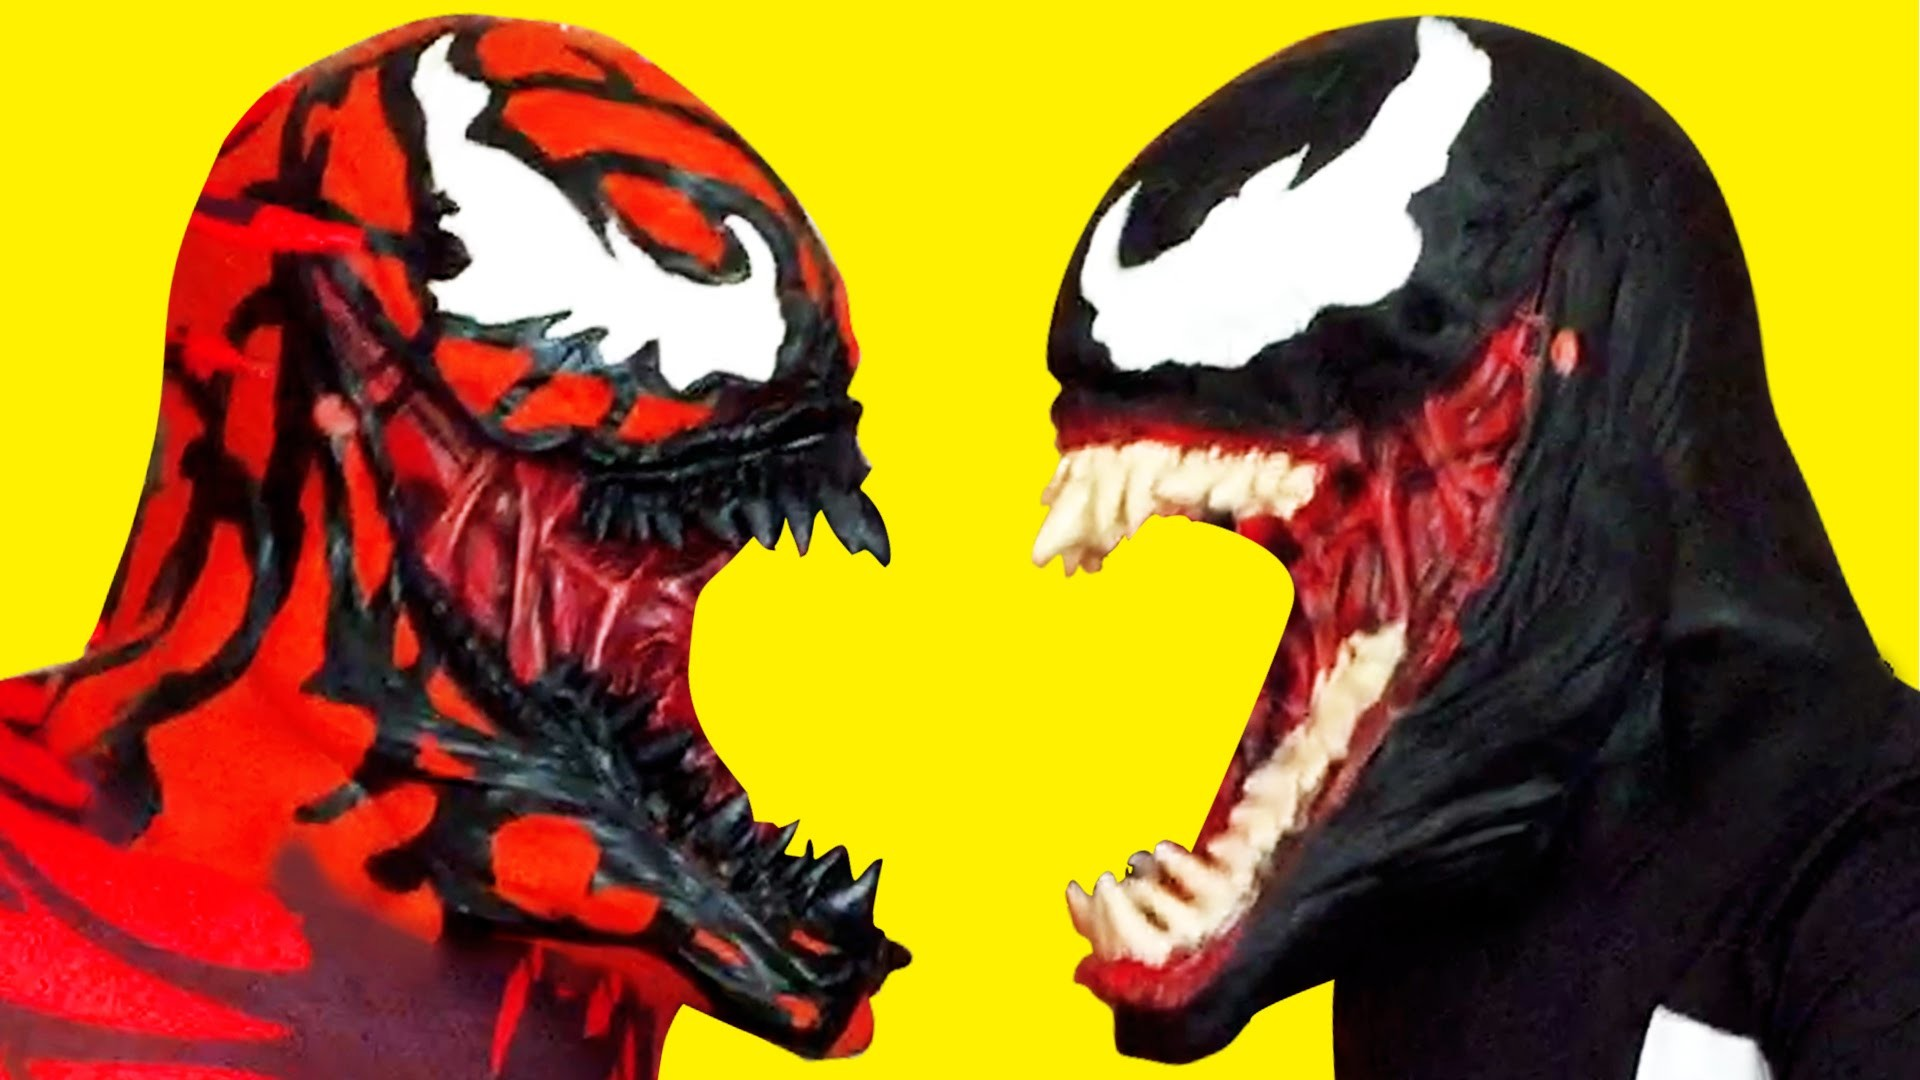 Venom Spiderman Villains vs Carnage Cereals Battle – Superhero in Real Life  Fun Movie